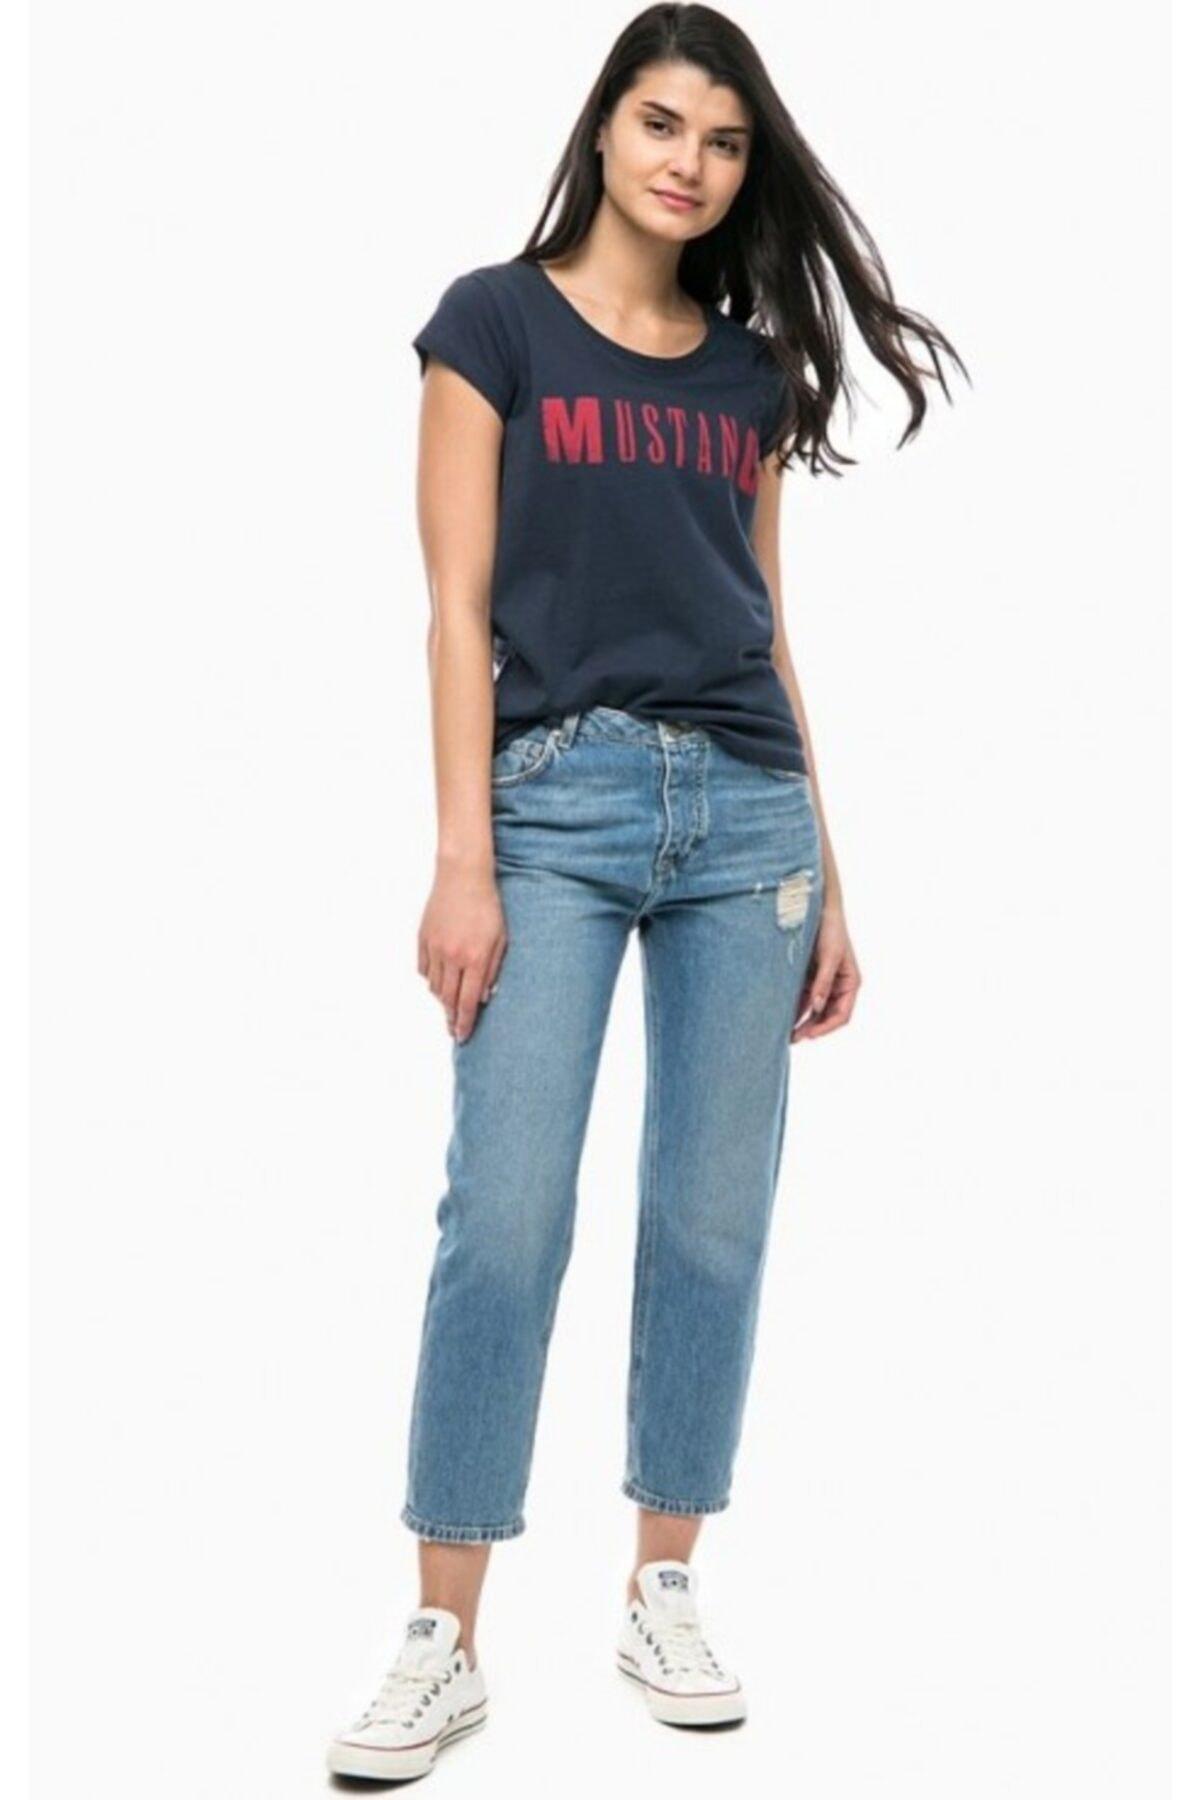 Mustang Kadın Lacivert Klasik Logo  T-shirt 1